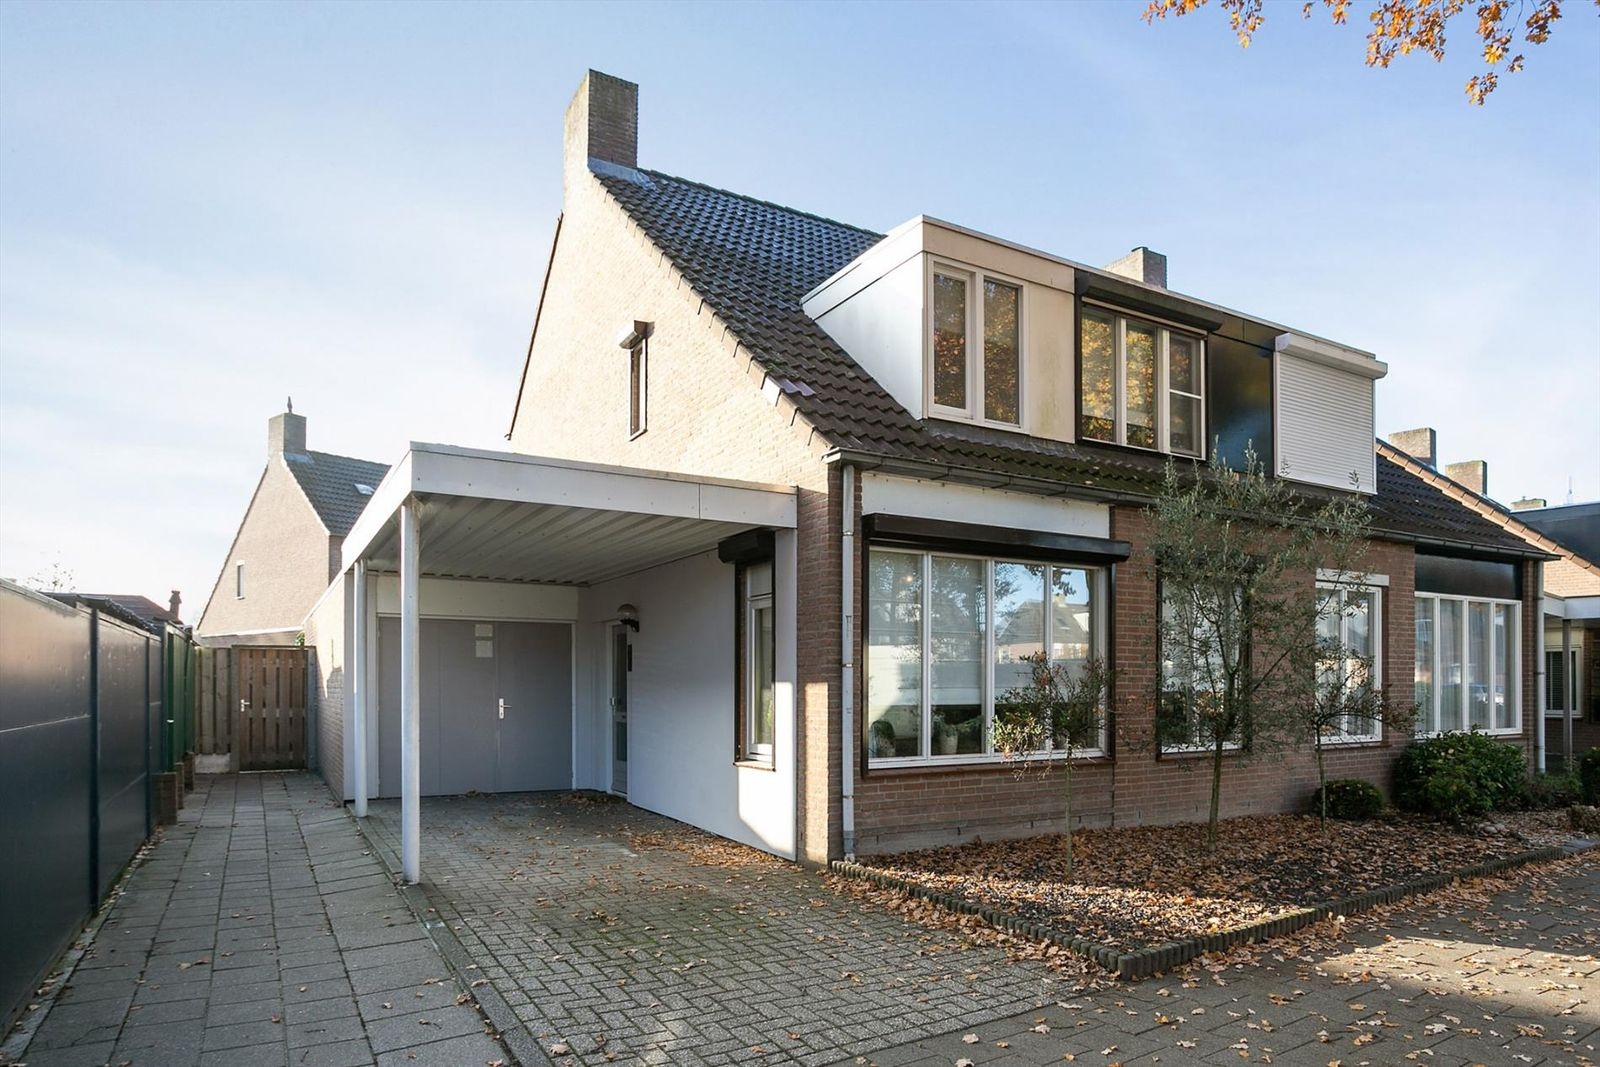 Hoevenstraat 103, Someren